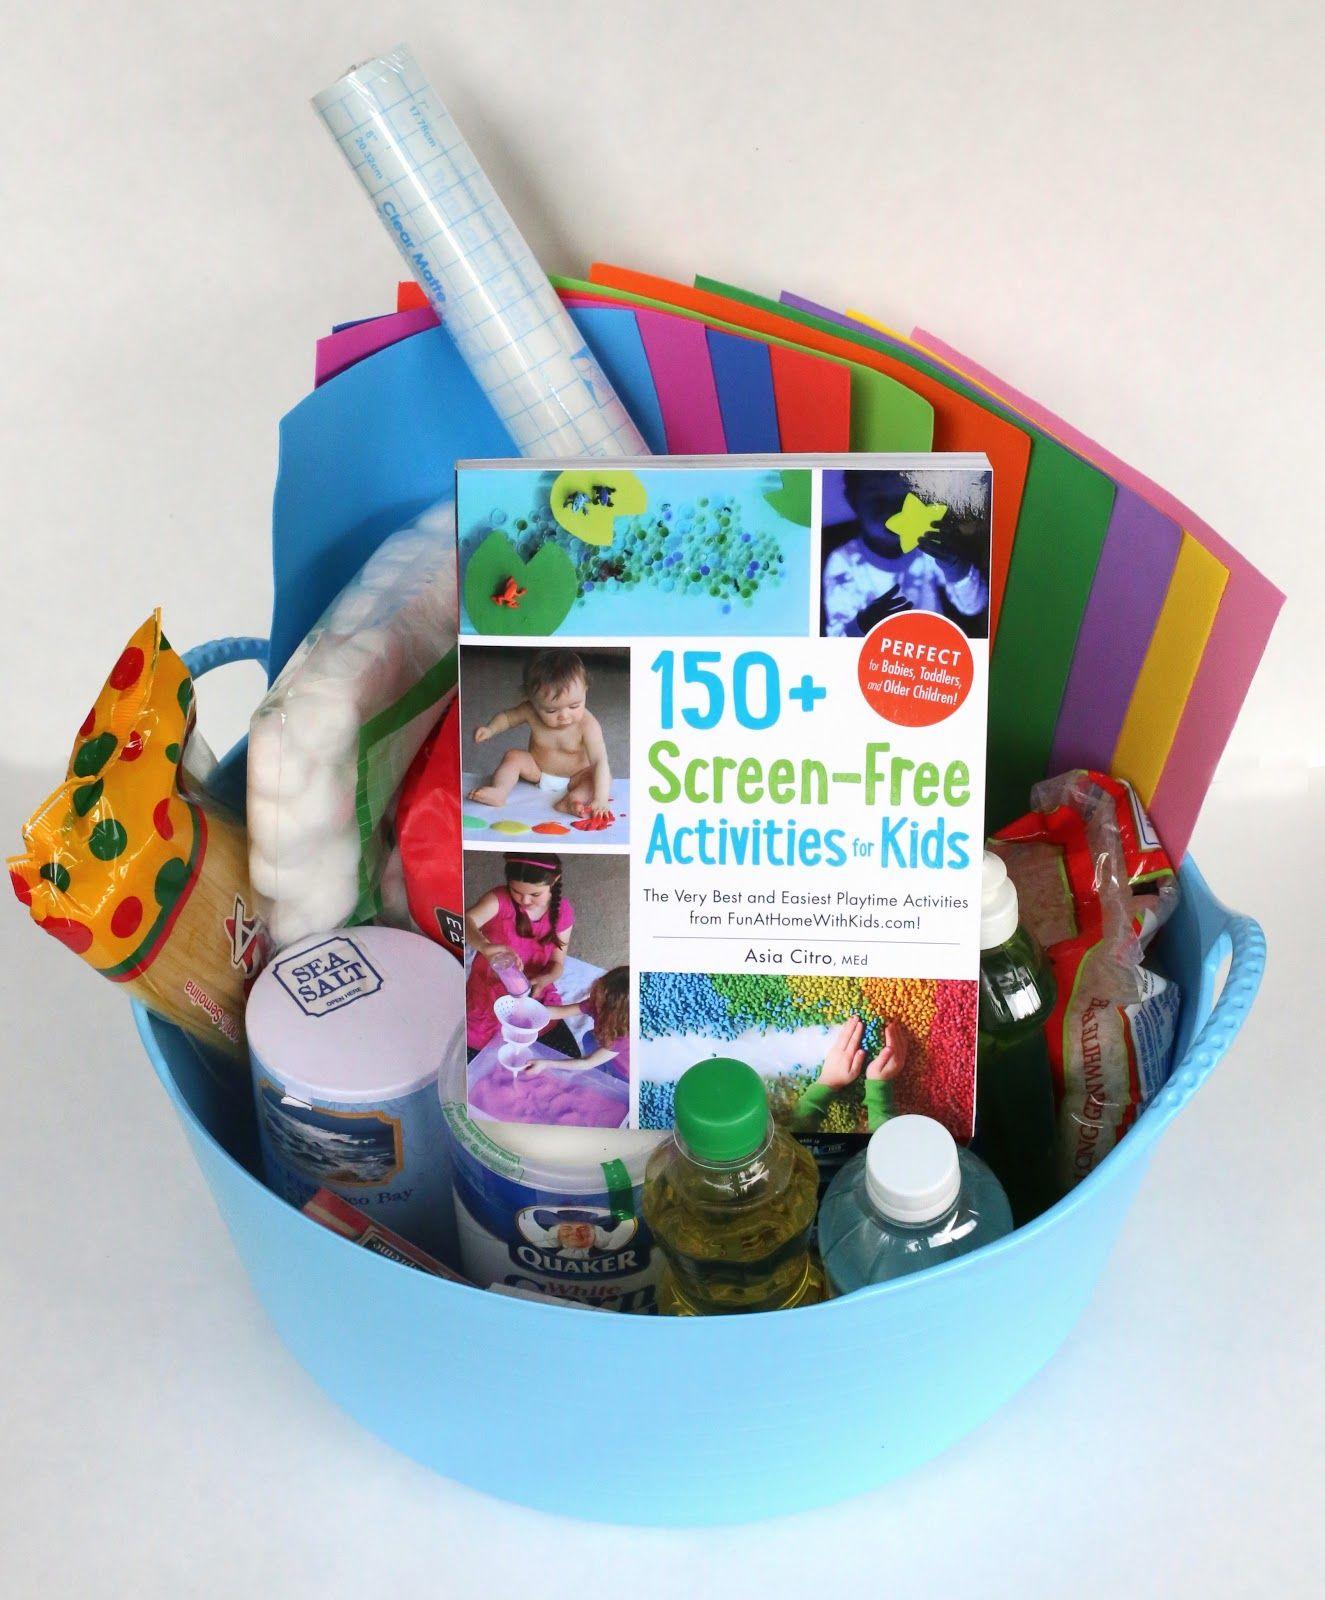 DIY Sensory Kits Creative Gifts for Kids